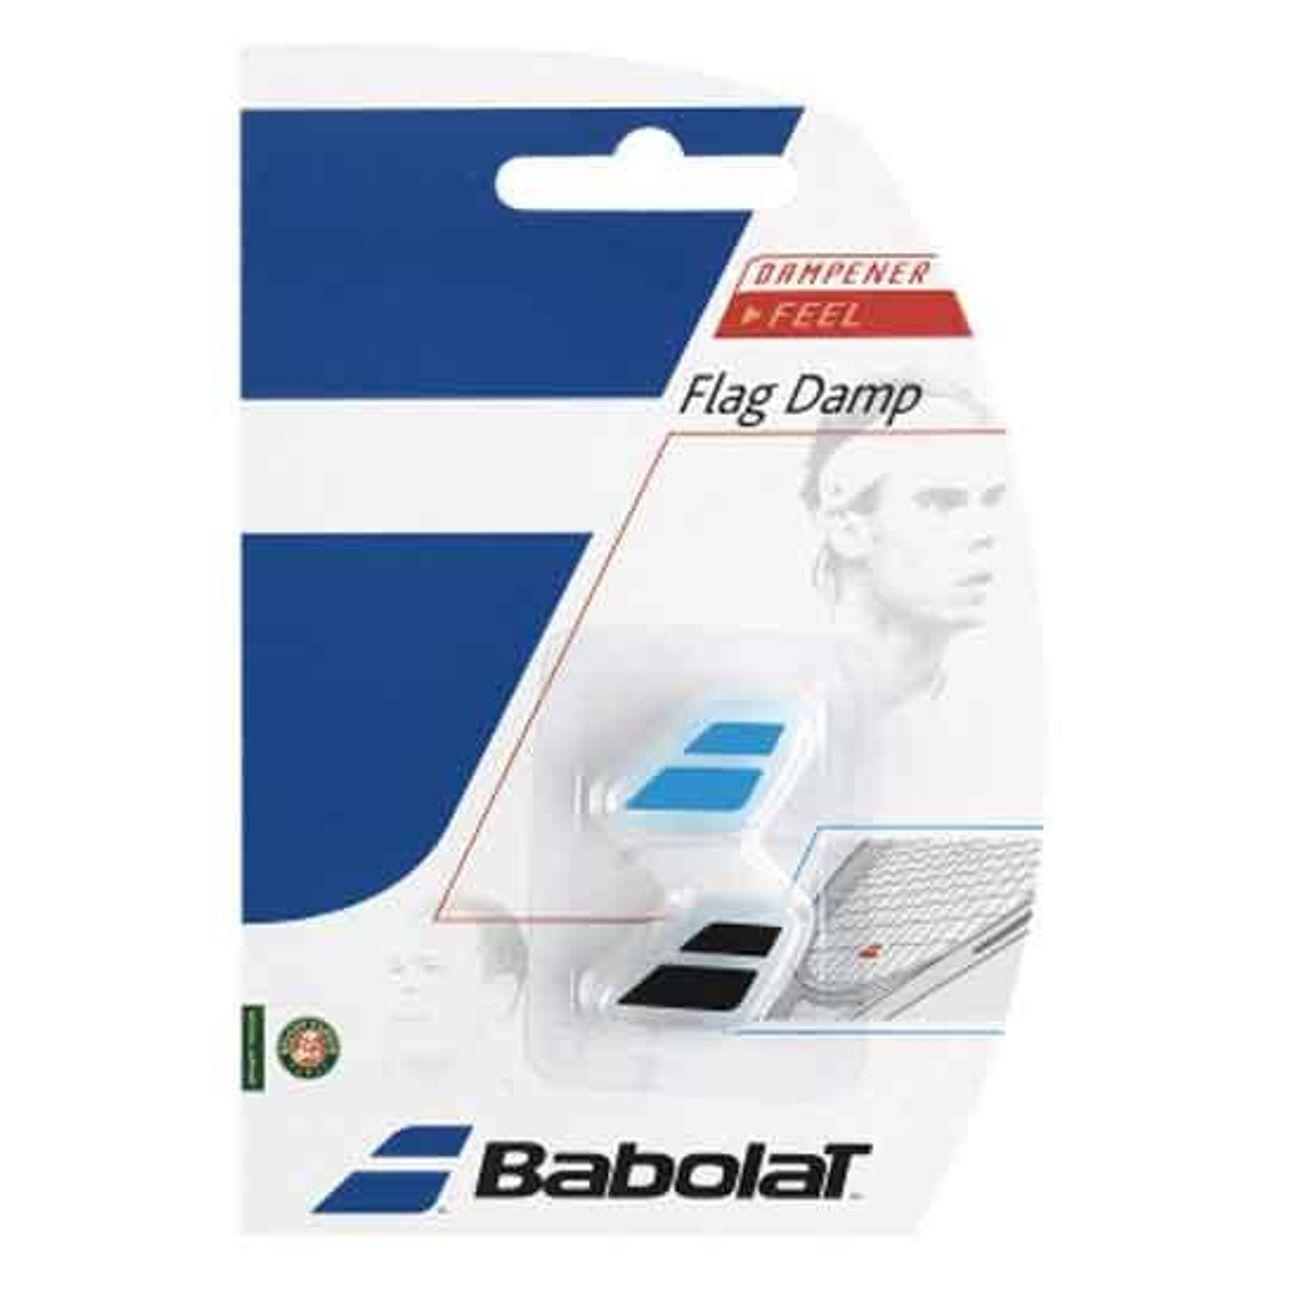 Tennis homme BABOLAT Babolat Flag Damp